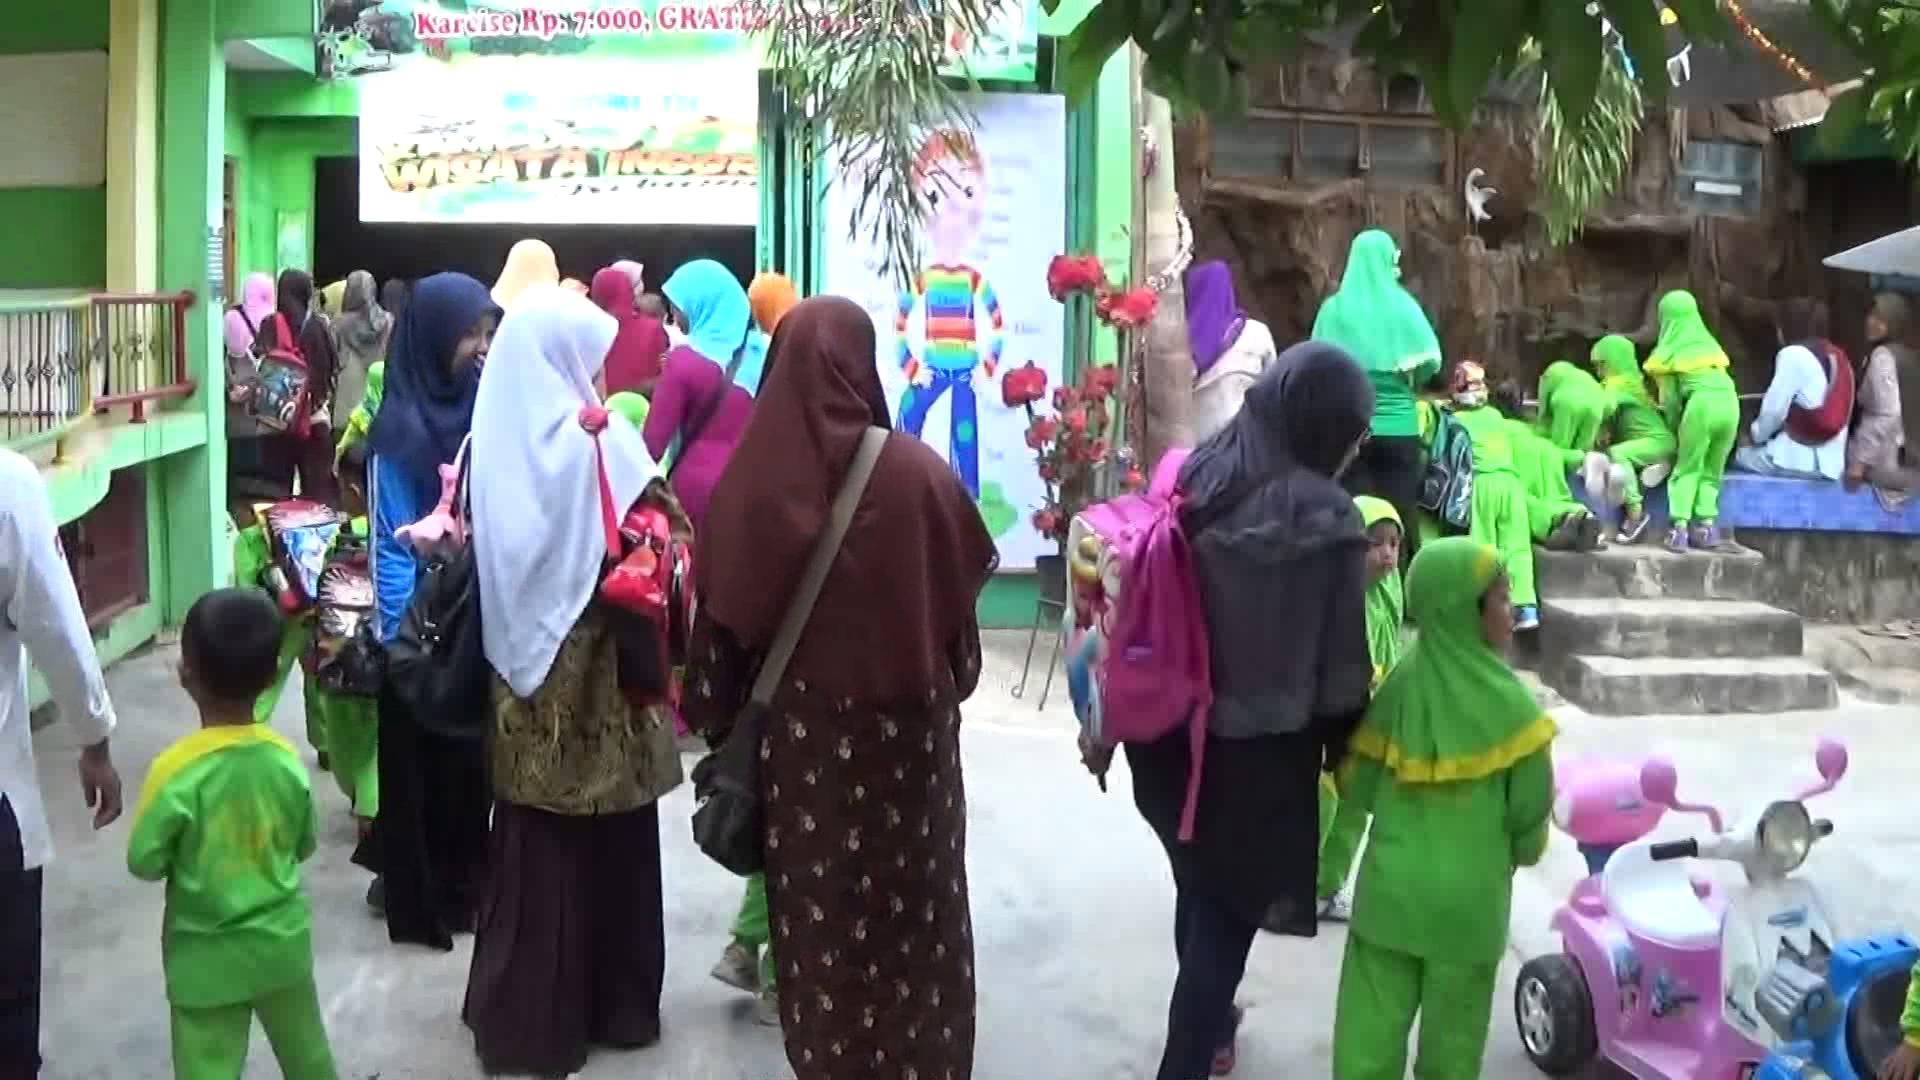 Suasana Taman Reptil Adiluhur Adimulyo Kebumen Youtube Kab